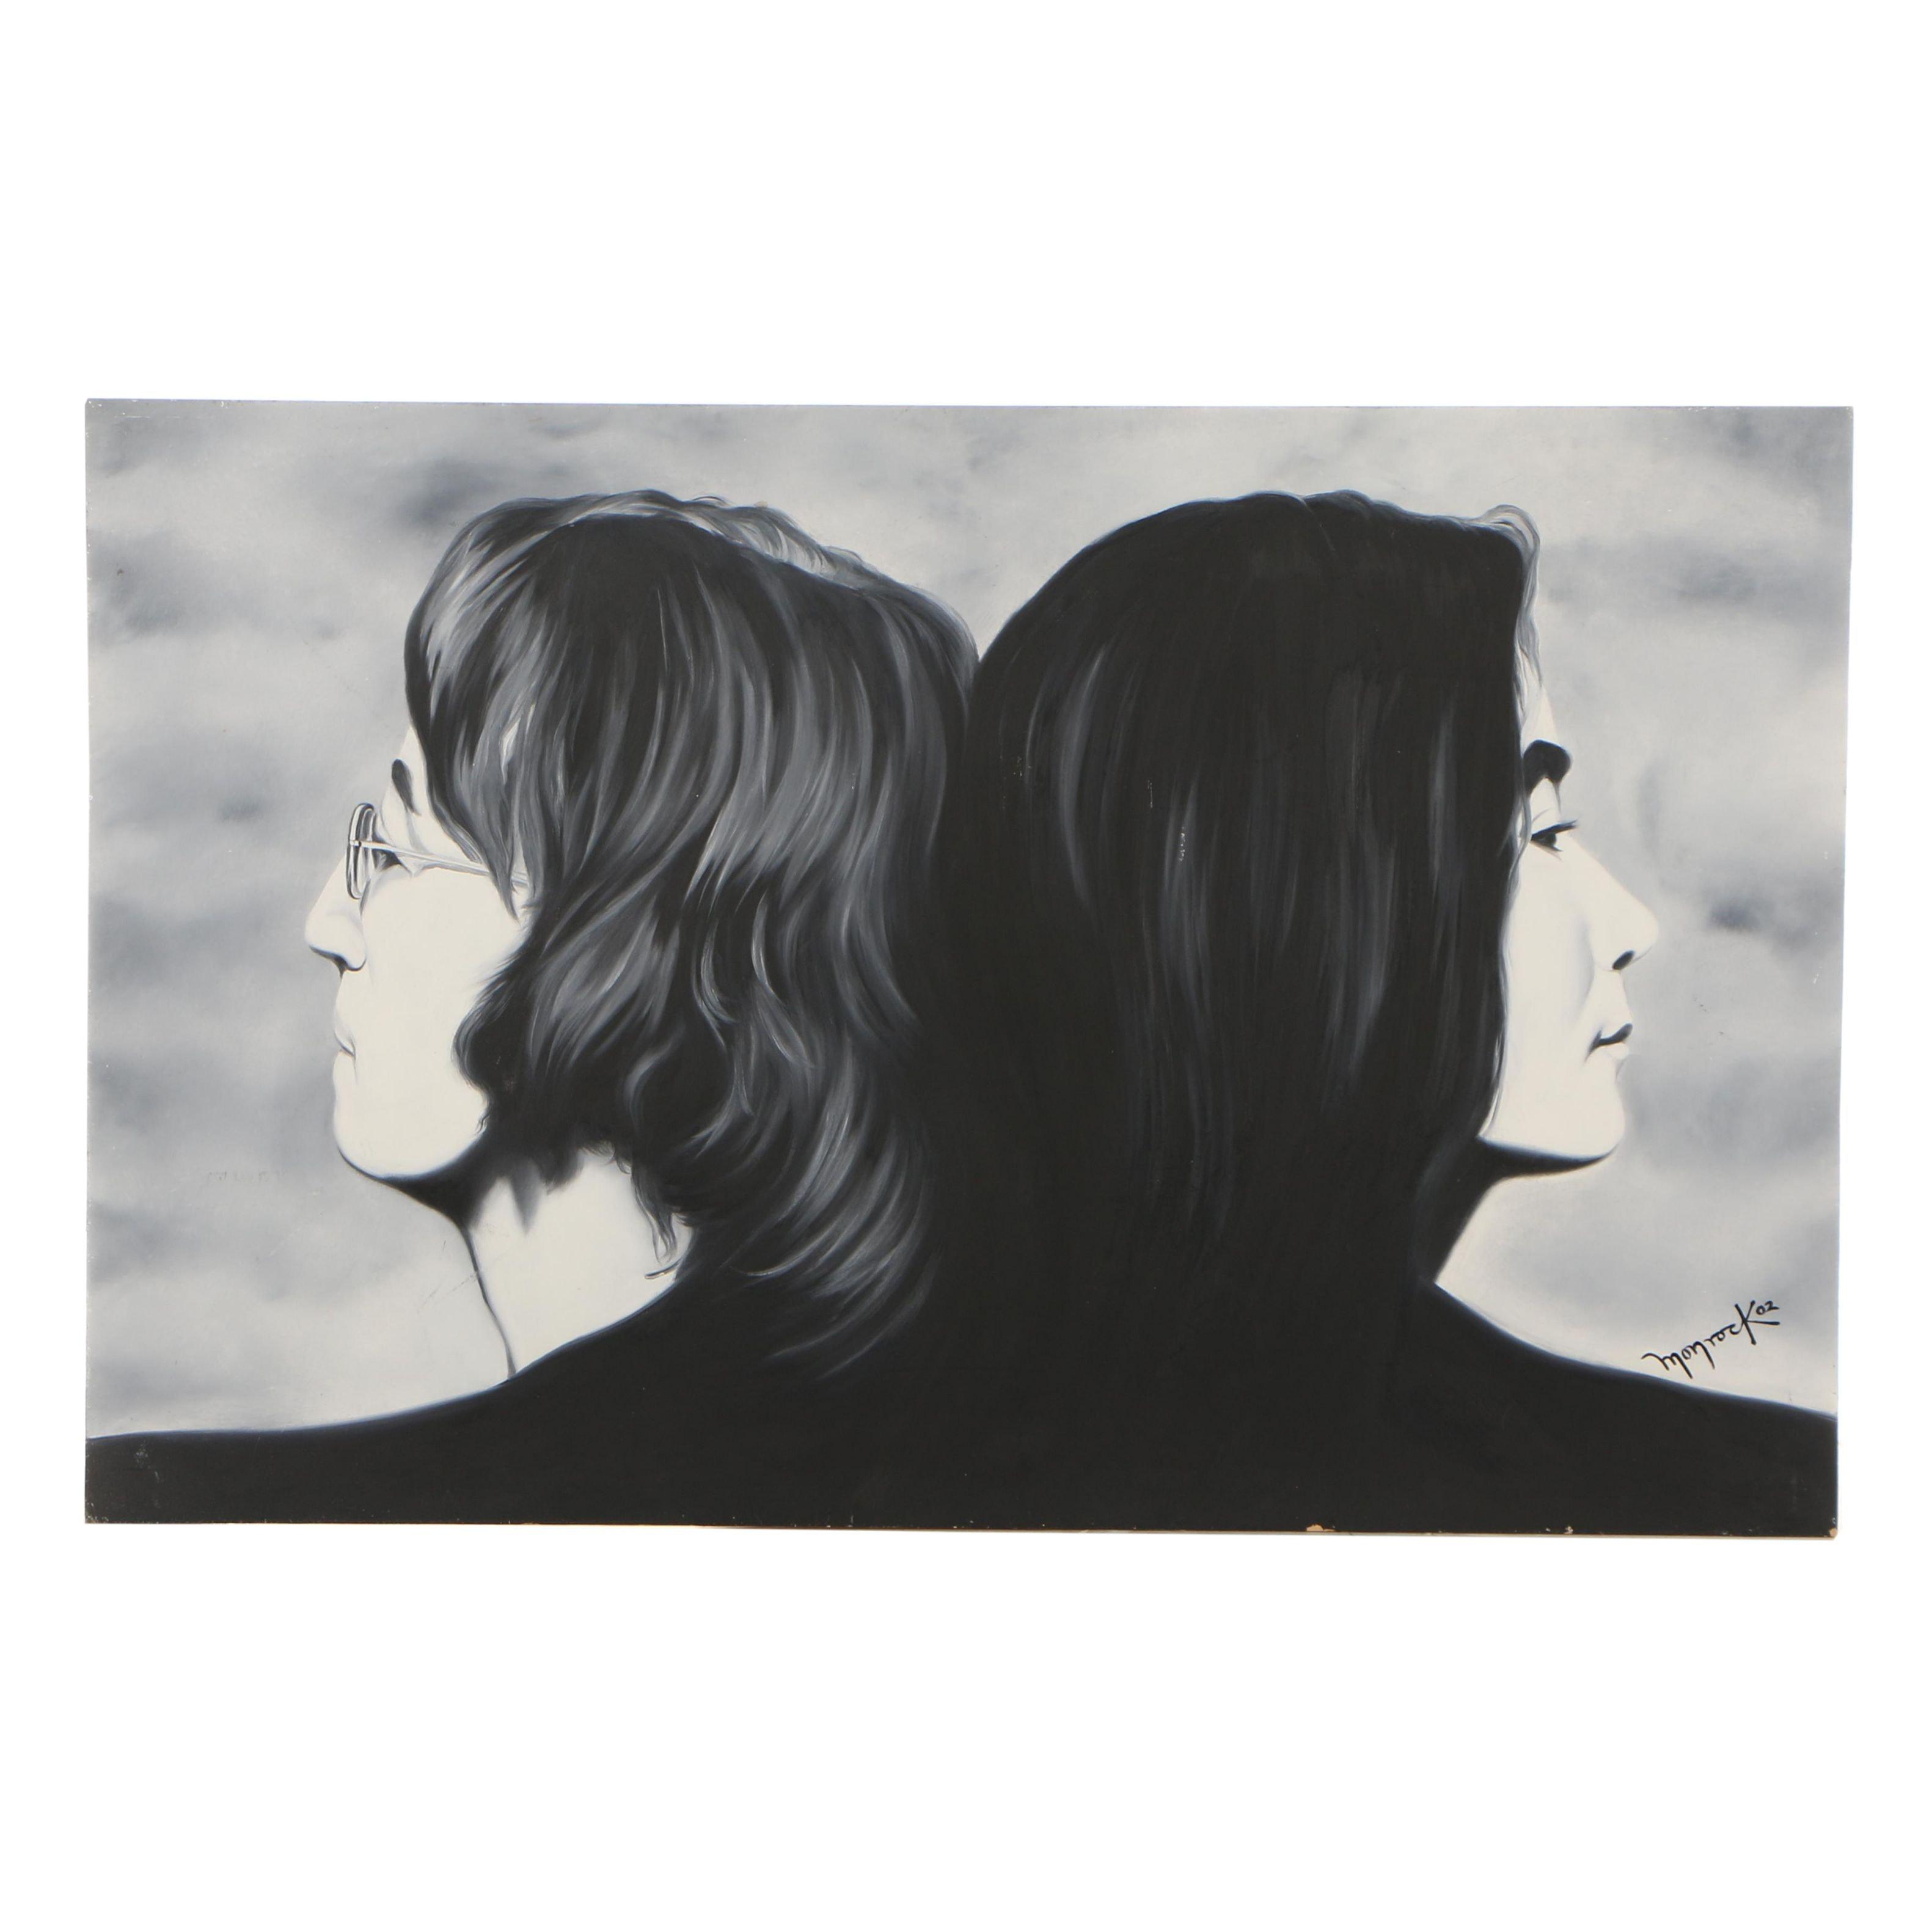 Hector Monroy (Monrock) 2002 John and Yoko Oil Painting on Board